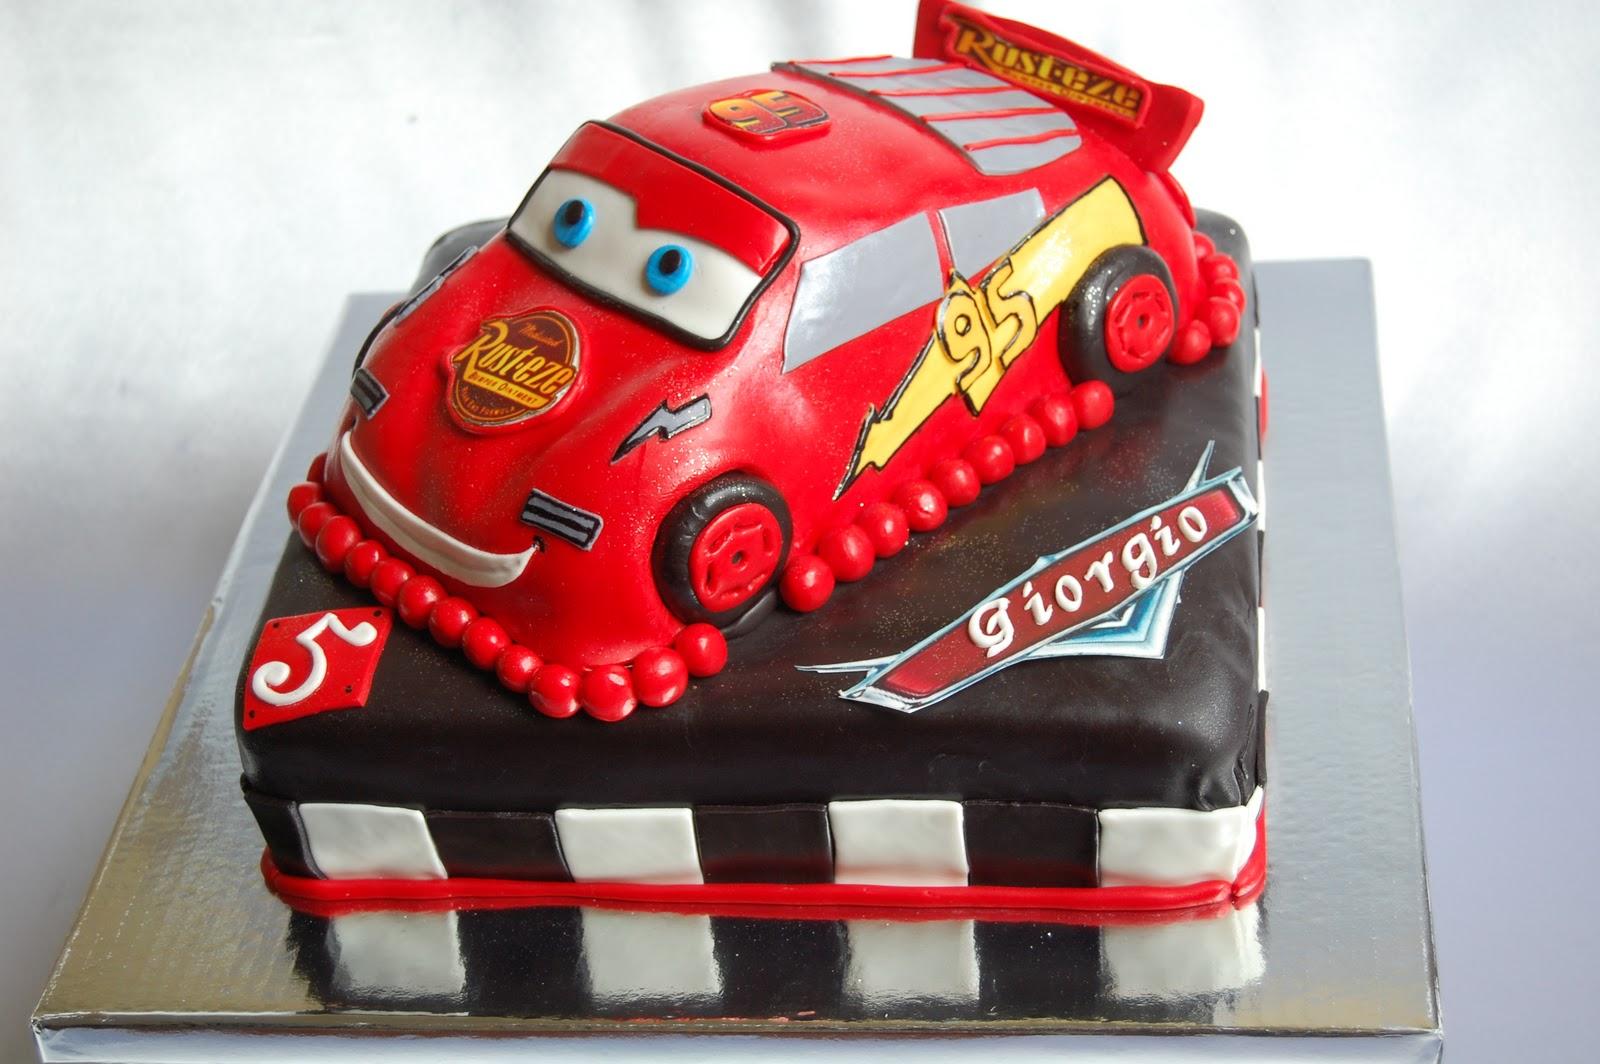 CUSTOMISED CAKES BY JEN: 1st birthday cake